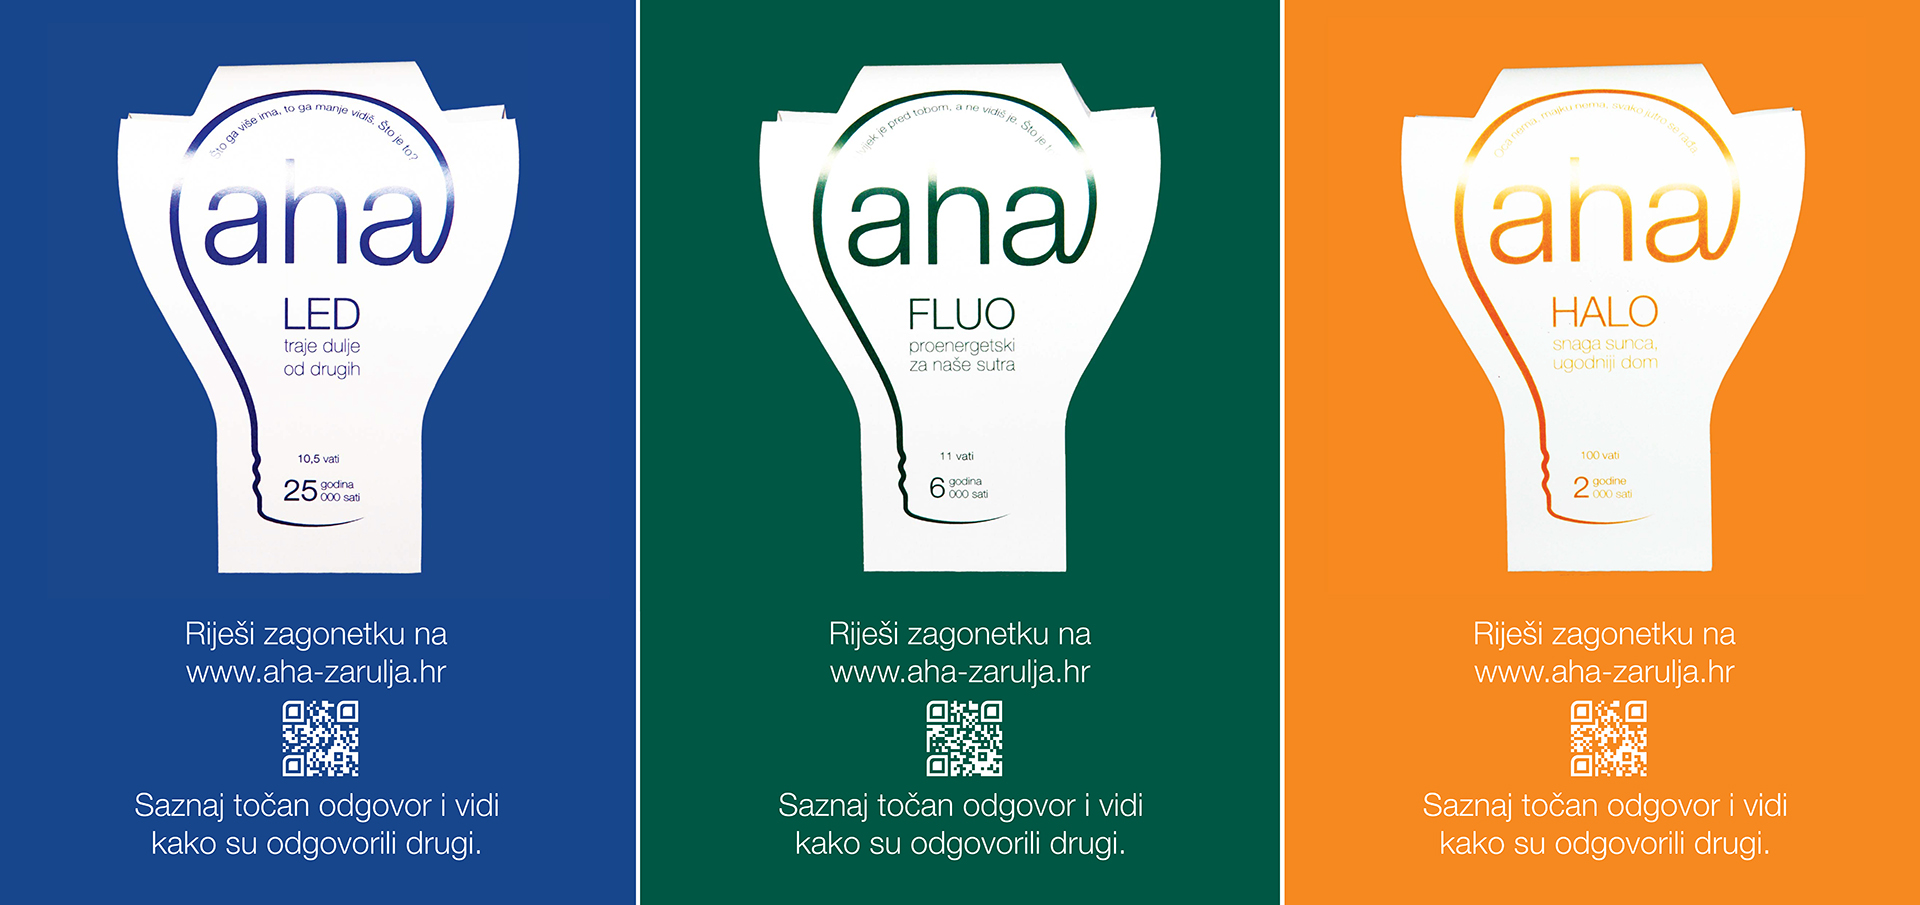 Aha light bulb packaging posters